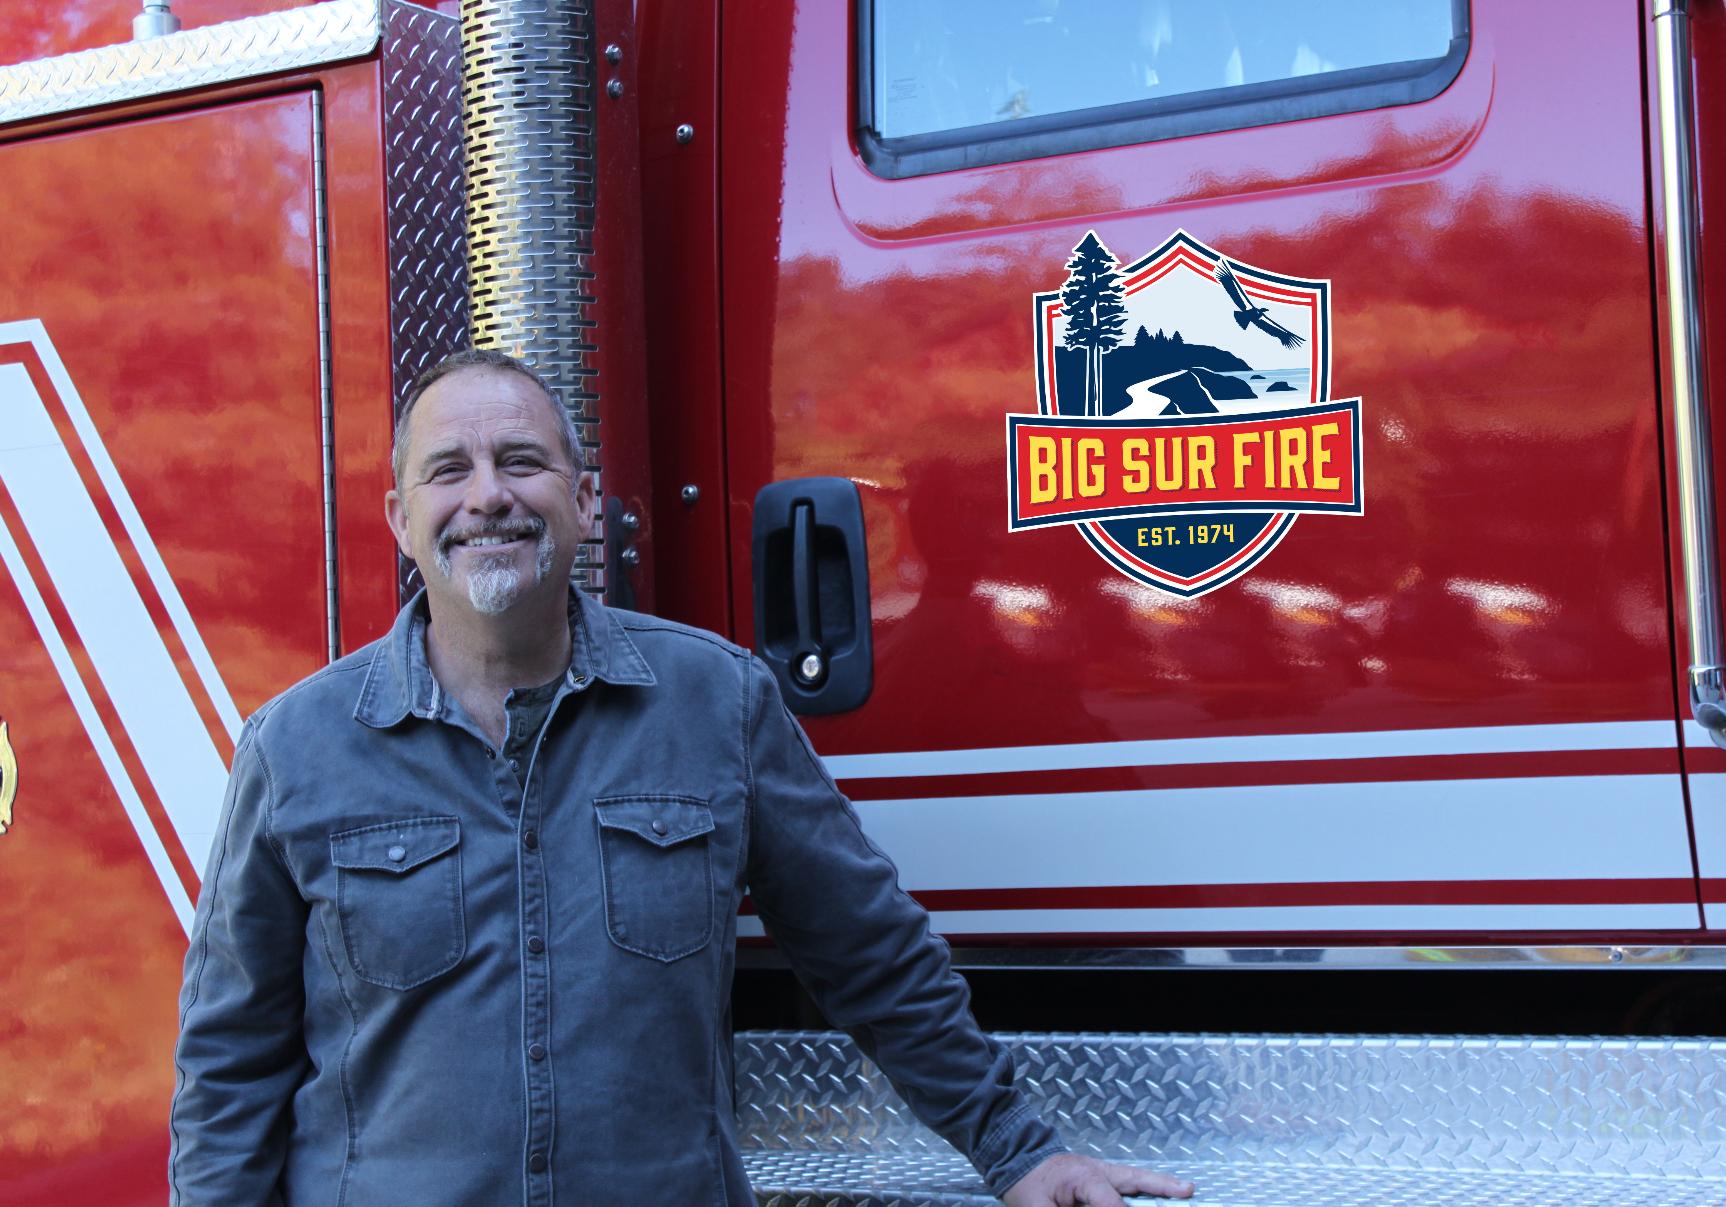 Big Sur Fire logo on truck